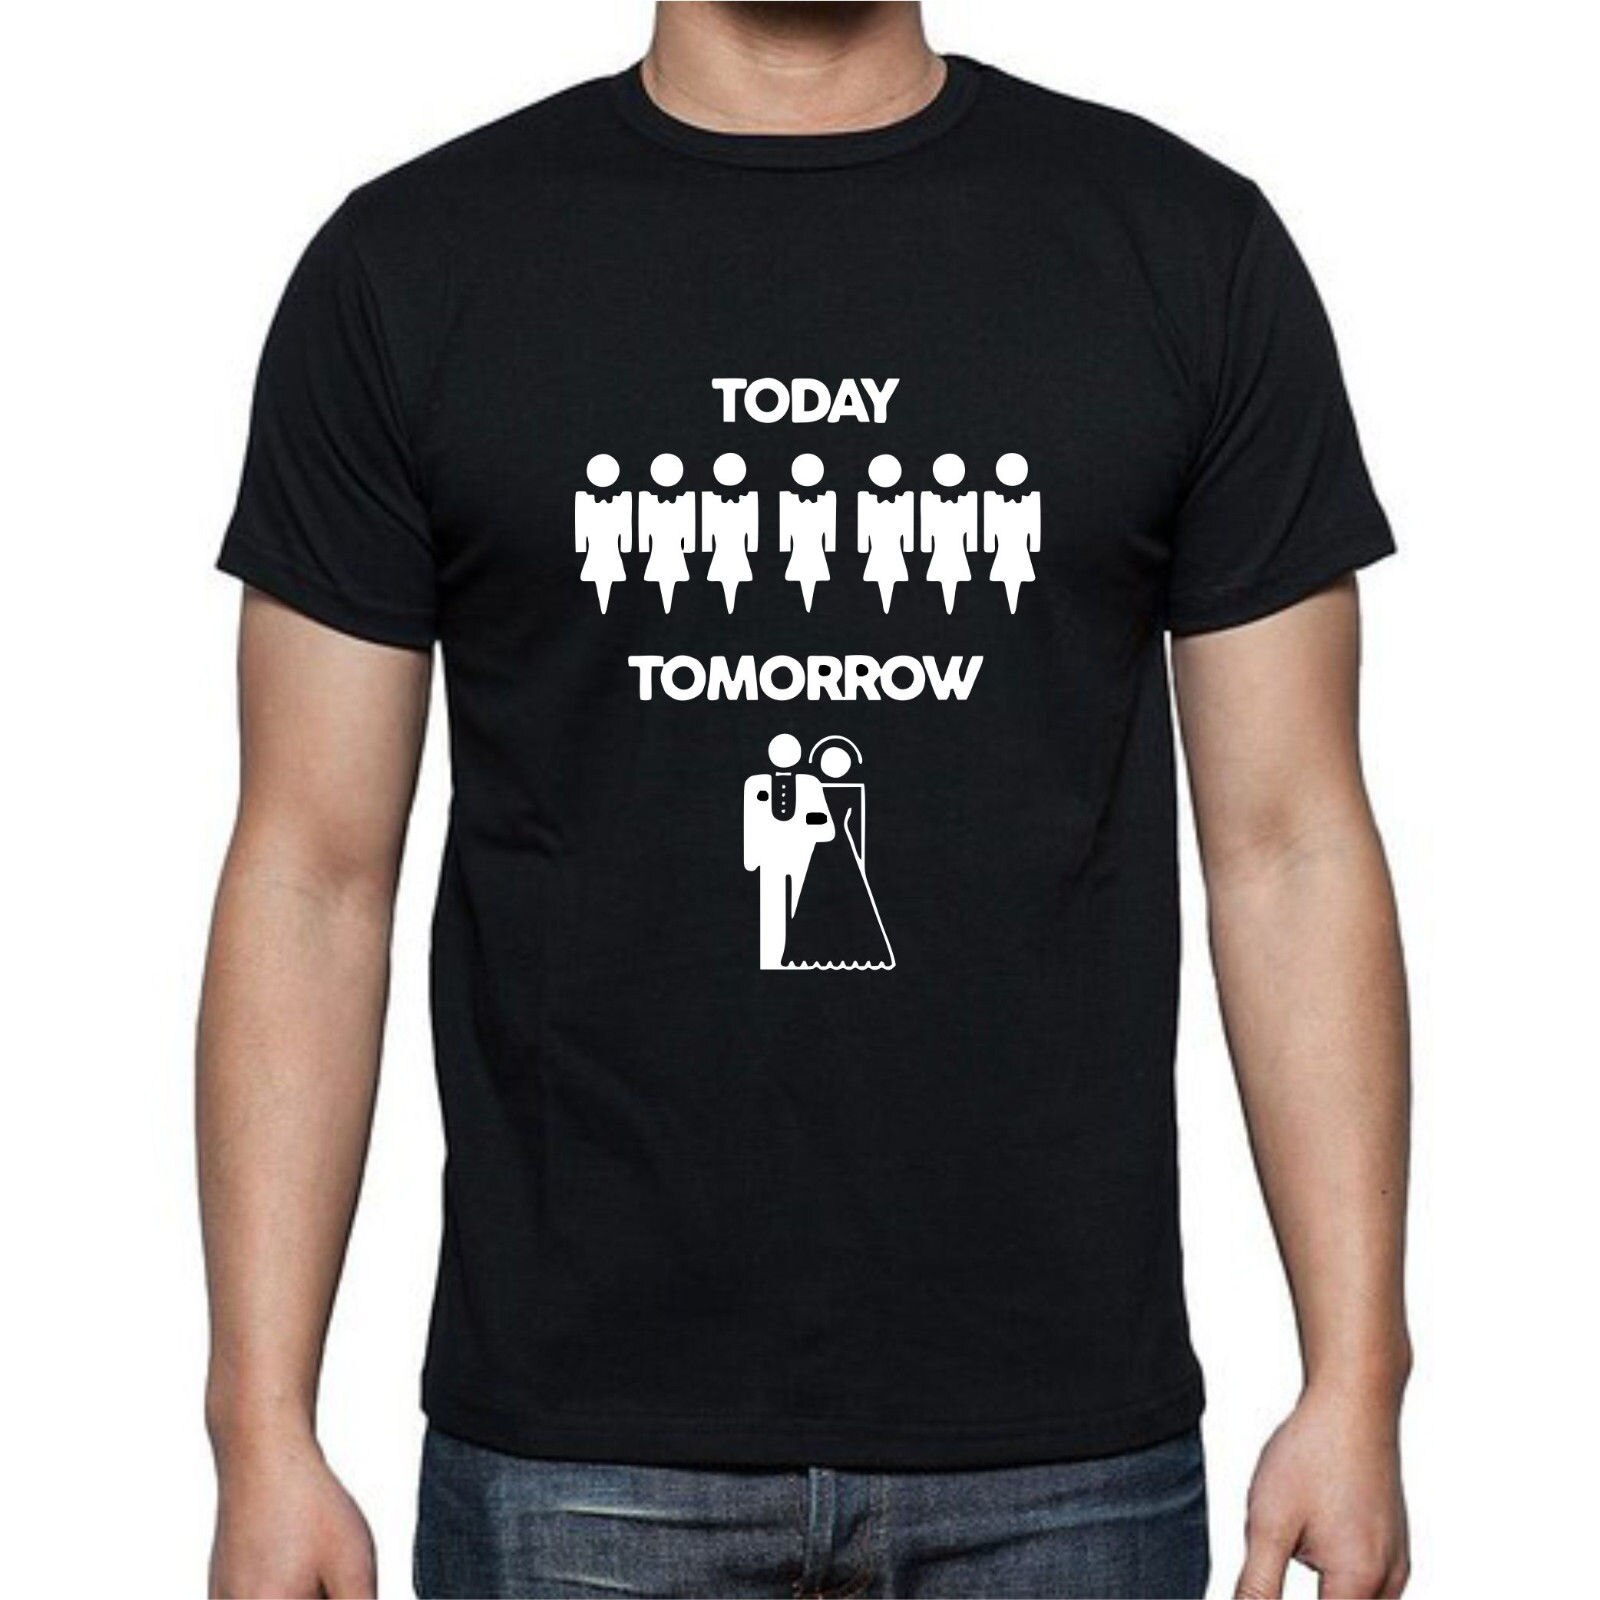 2019 nueva moda Casual hombres camiseta hoy mañana matrimonio despedida de soltera fiesta camiseta